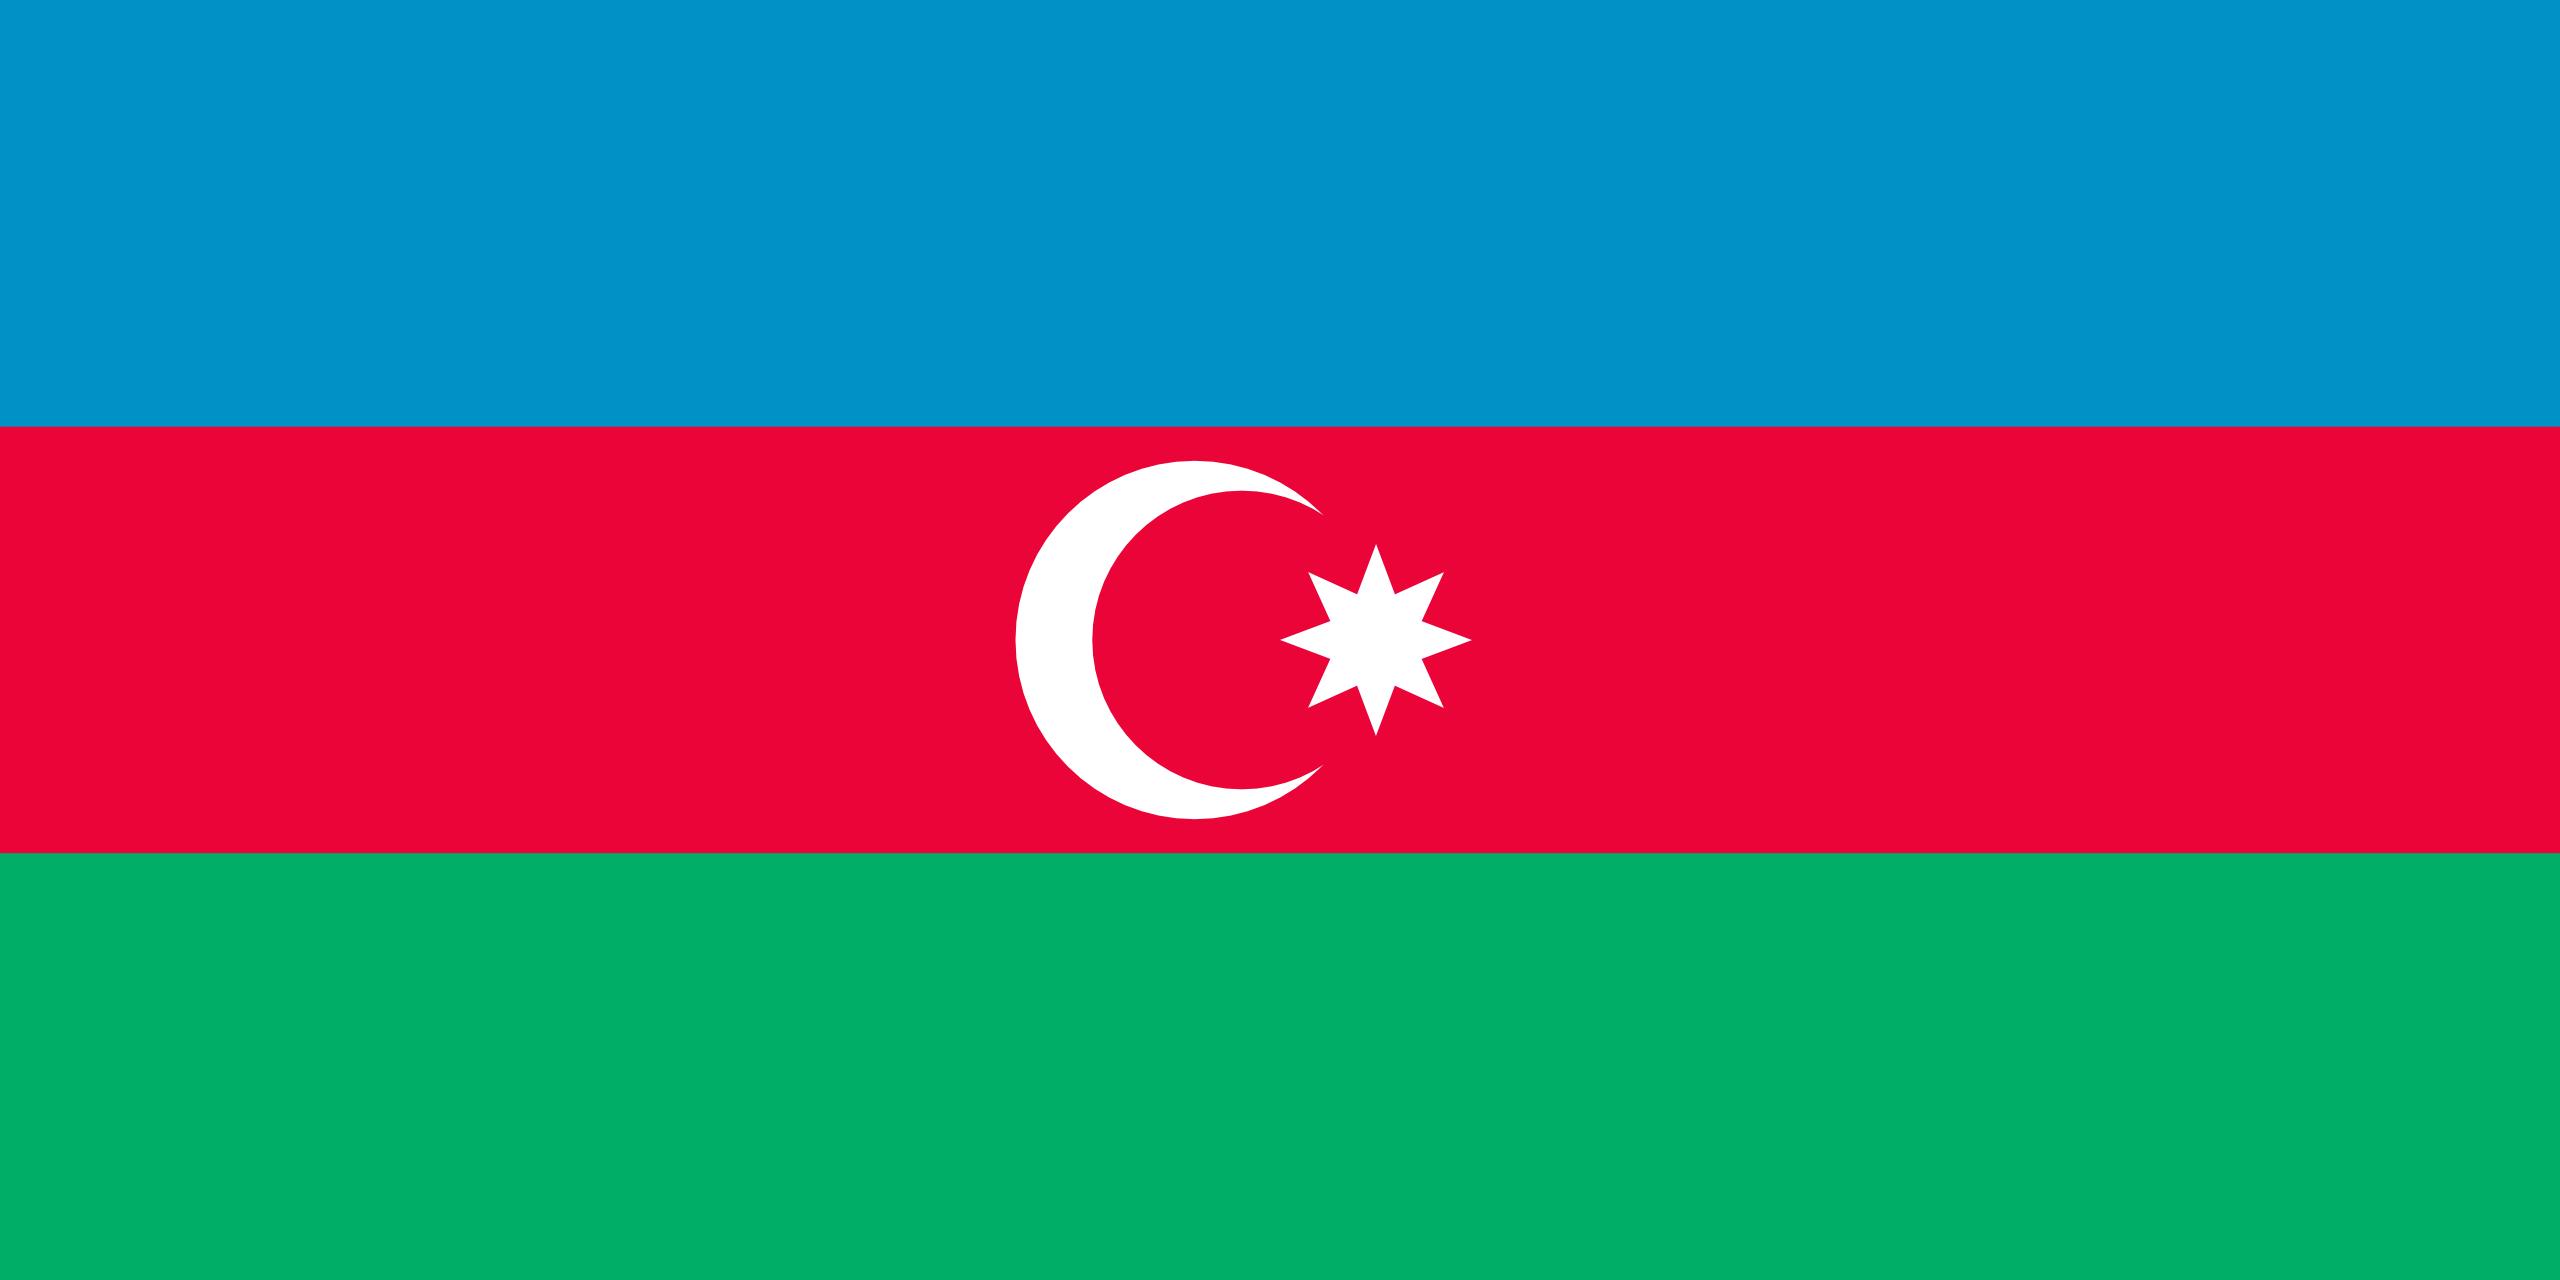 Aserbaidschan, Land, Emblem, Logo, Symbol - Wallpaper HD - Prof.-falken.com